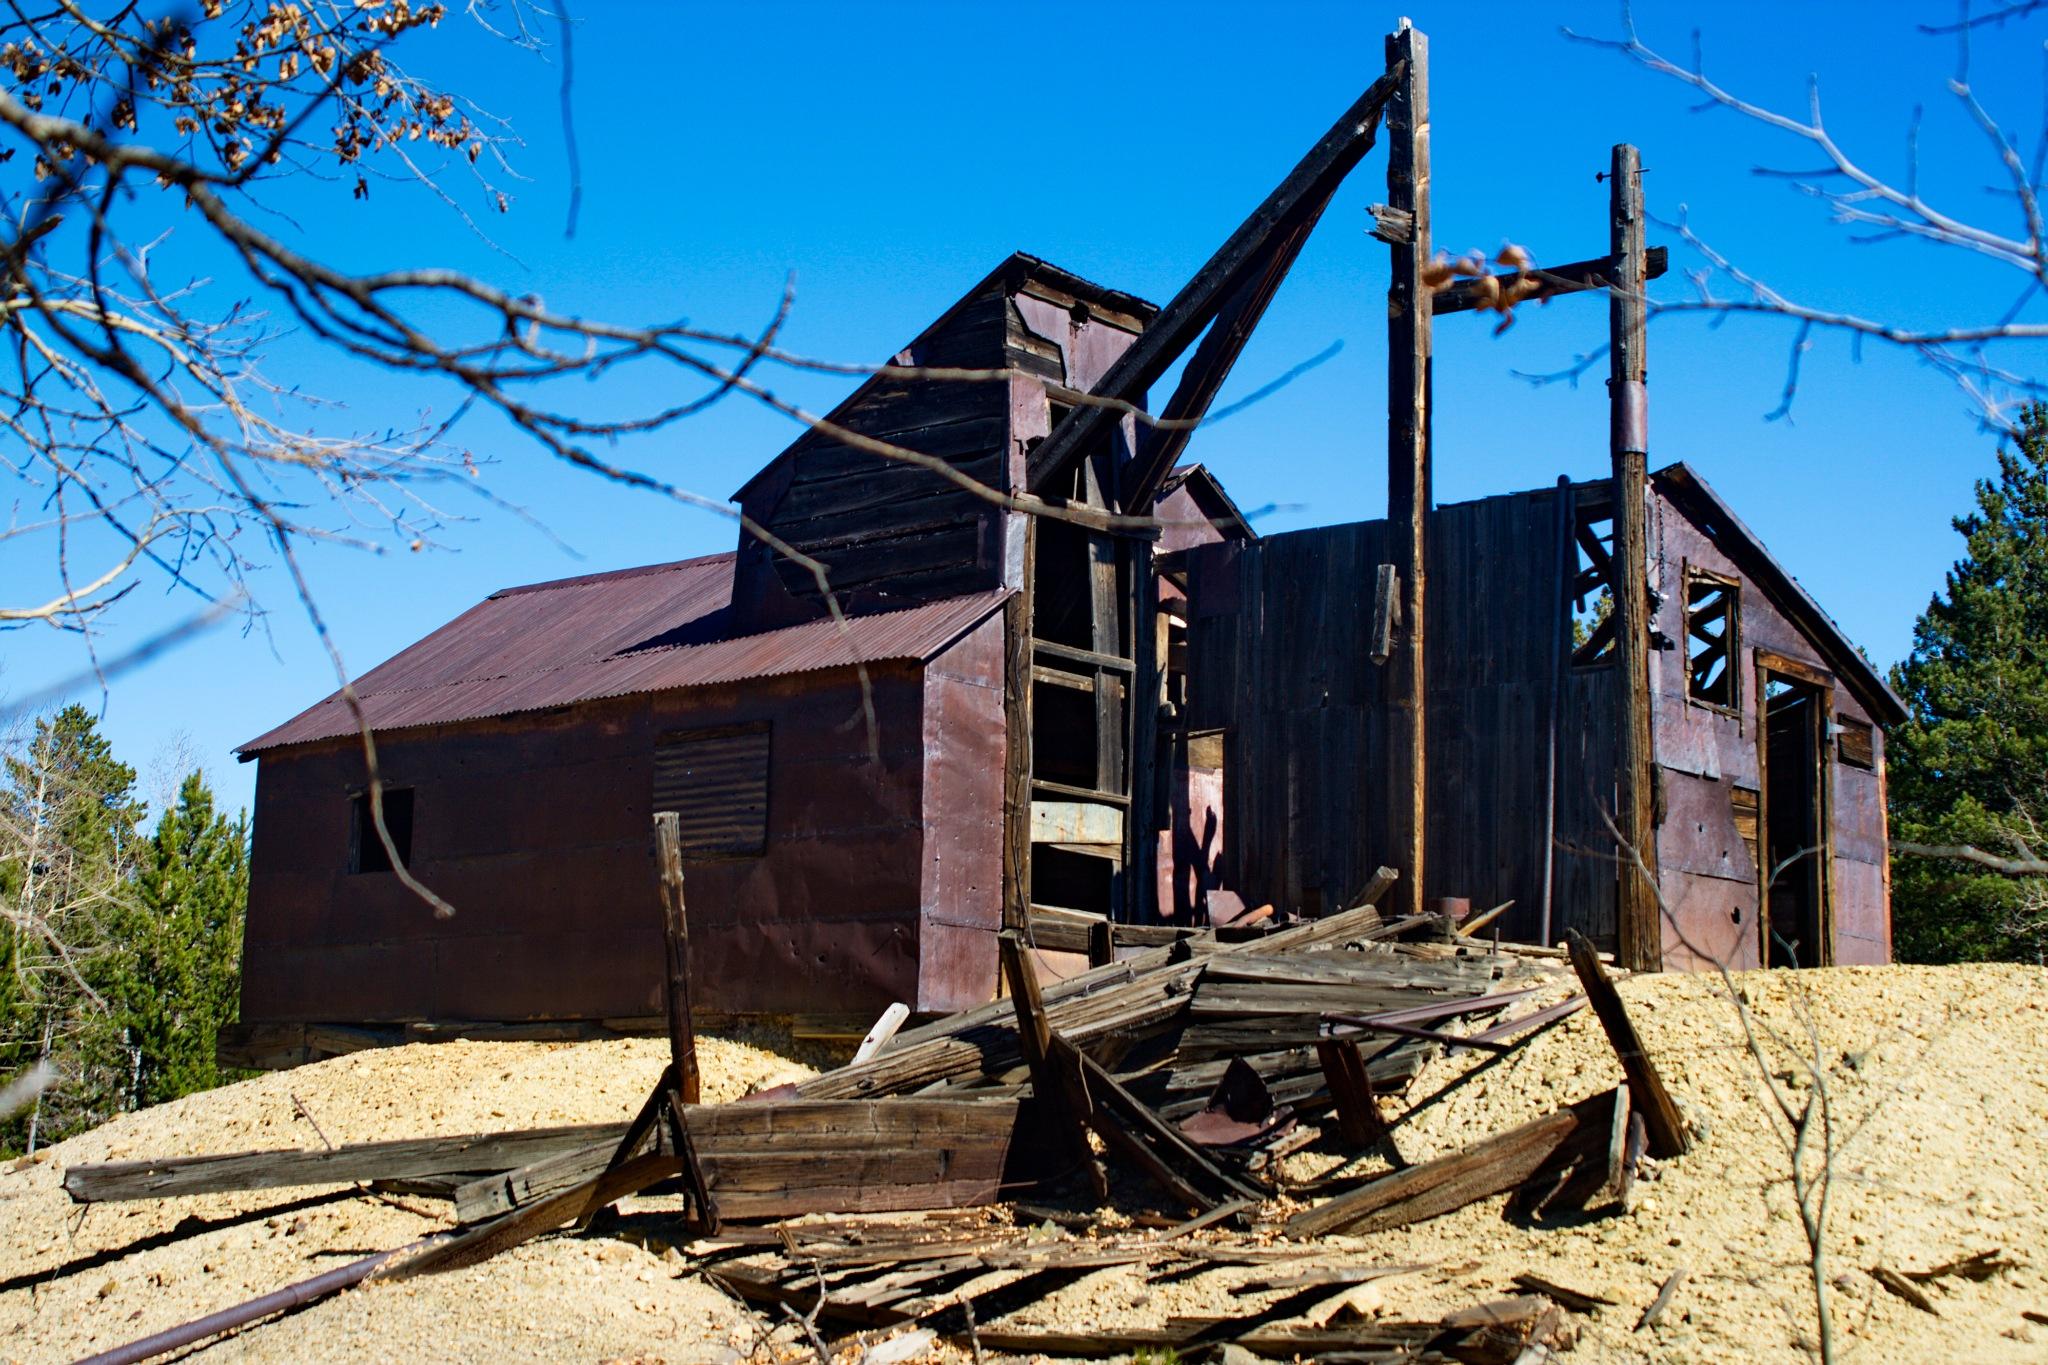 Old Mining Mill by daniel.luna.77920